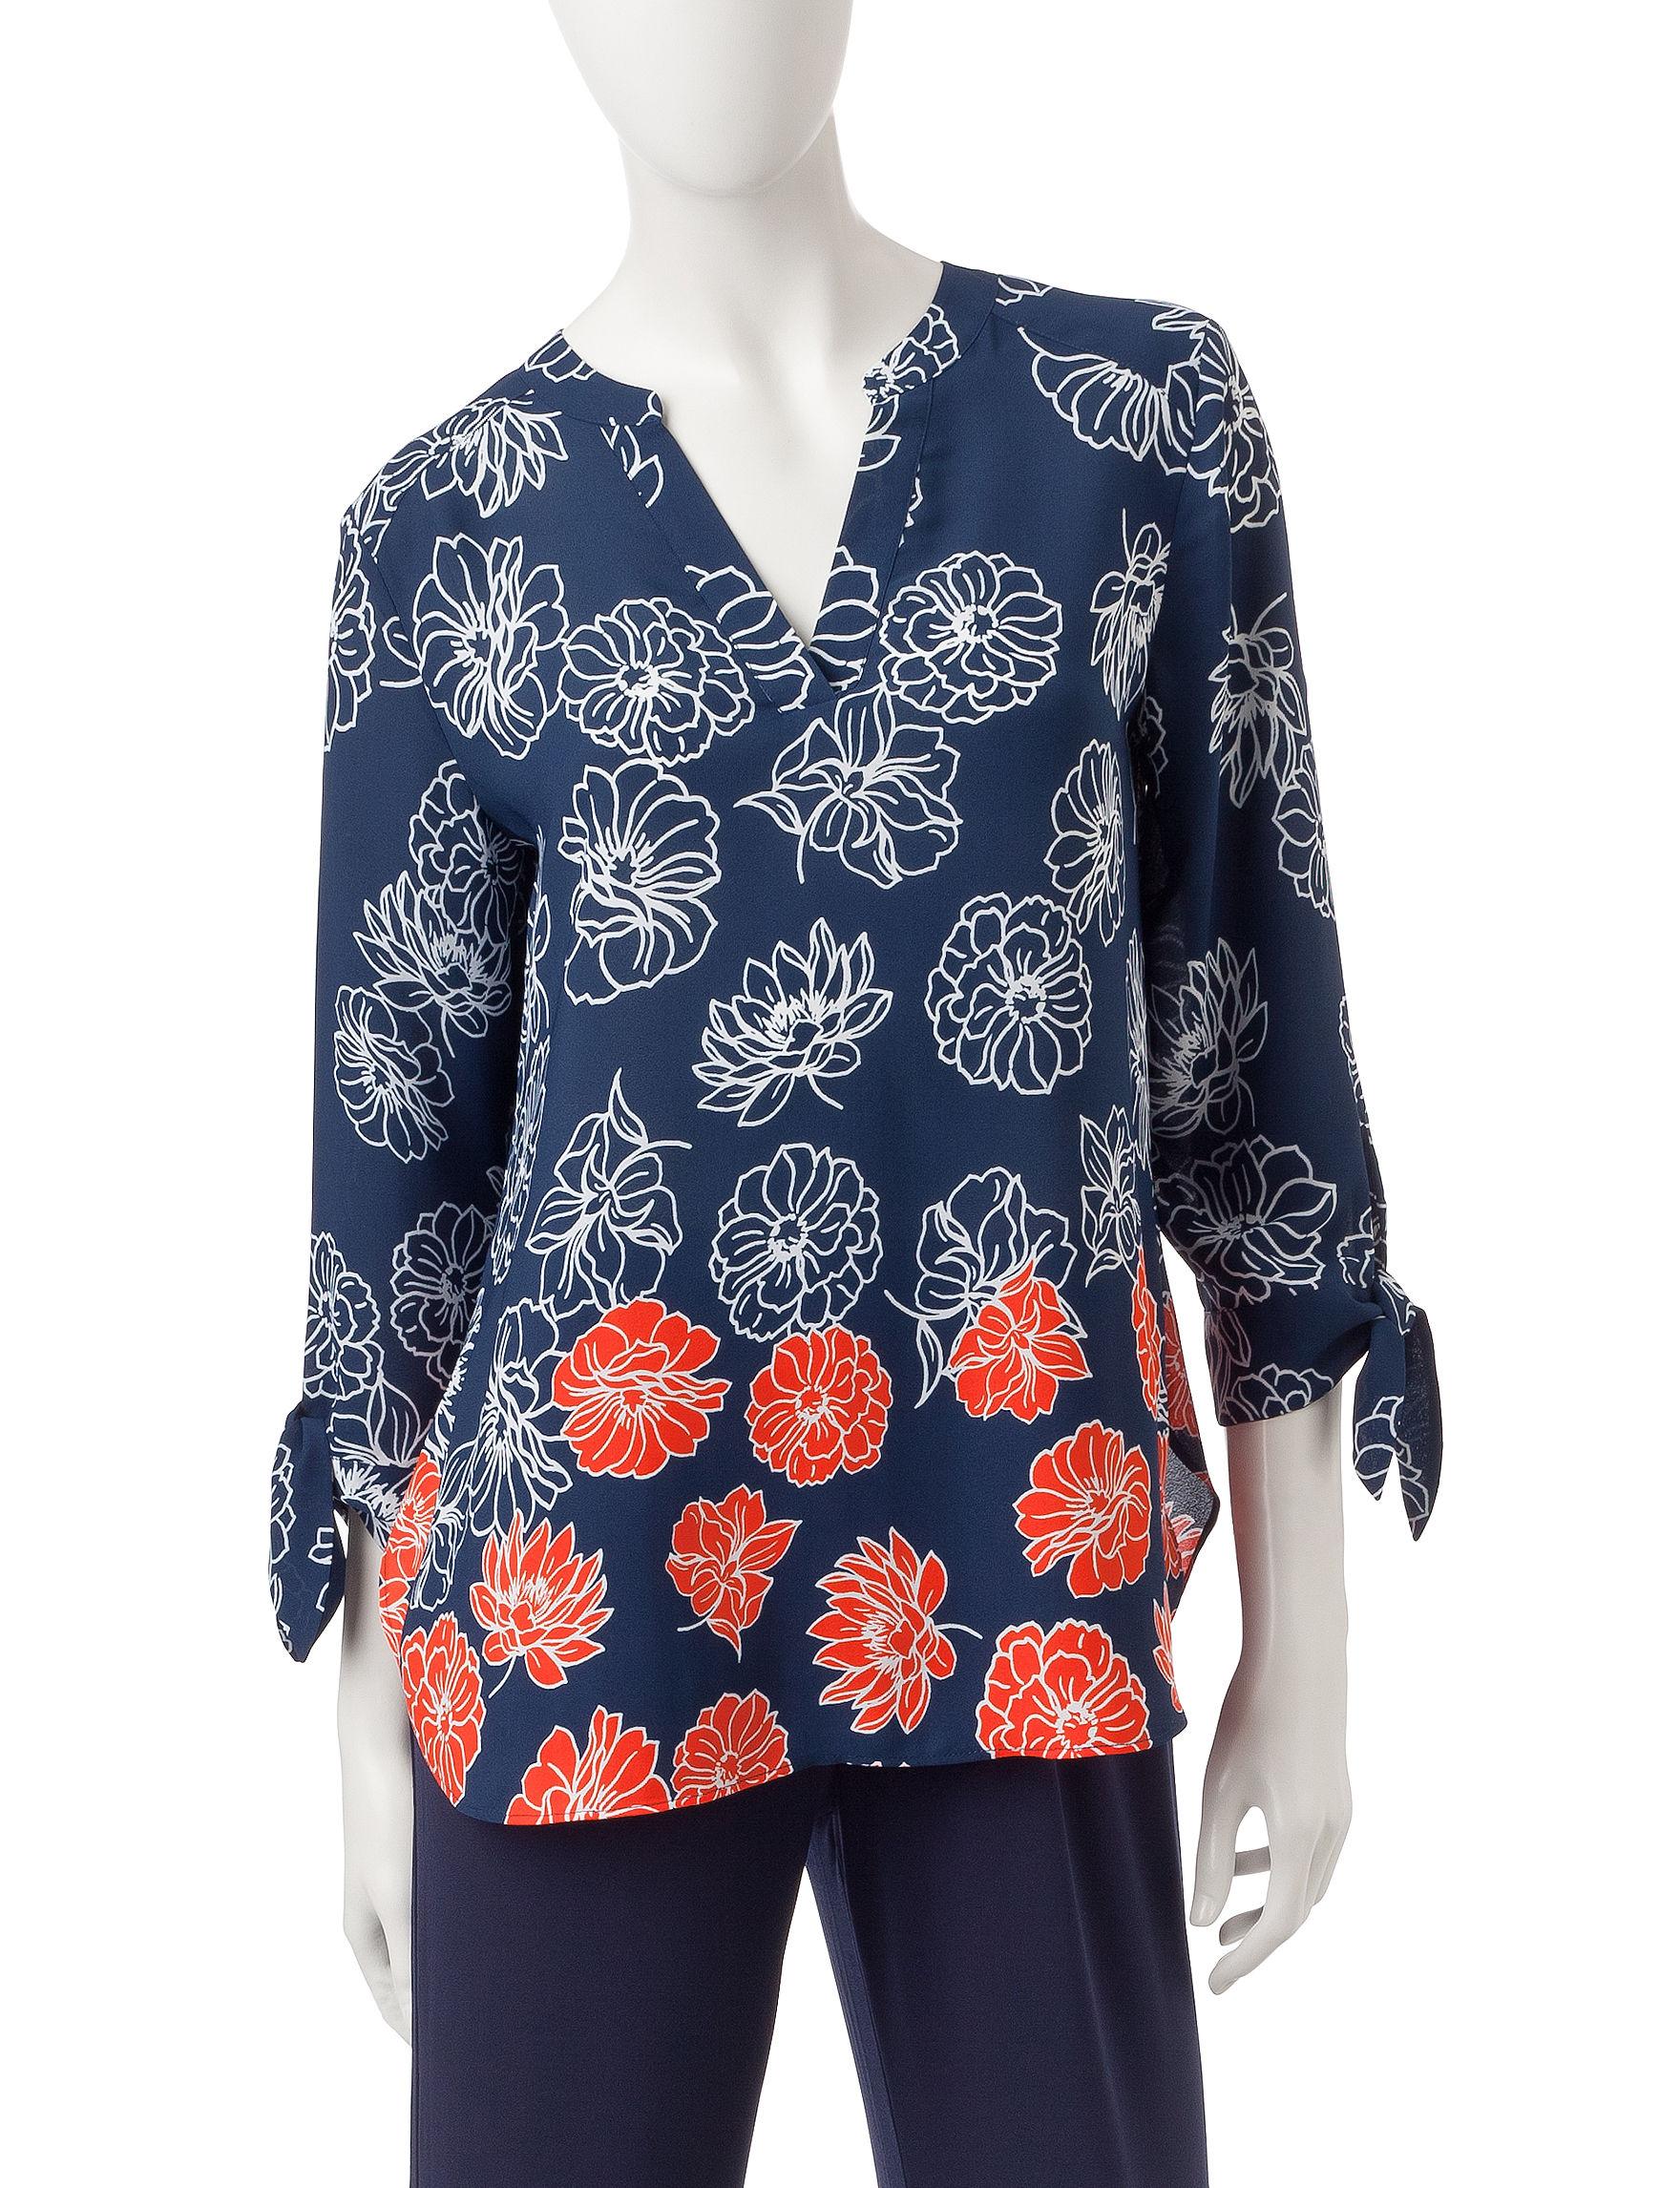 Valerie Stevens Navy / Coral Shirts & Blouses